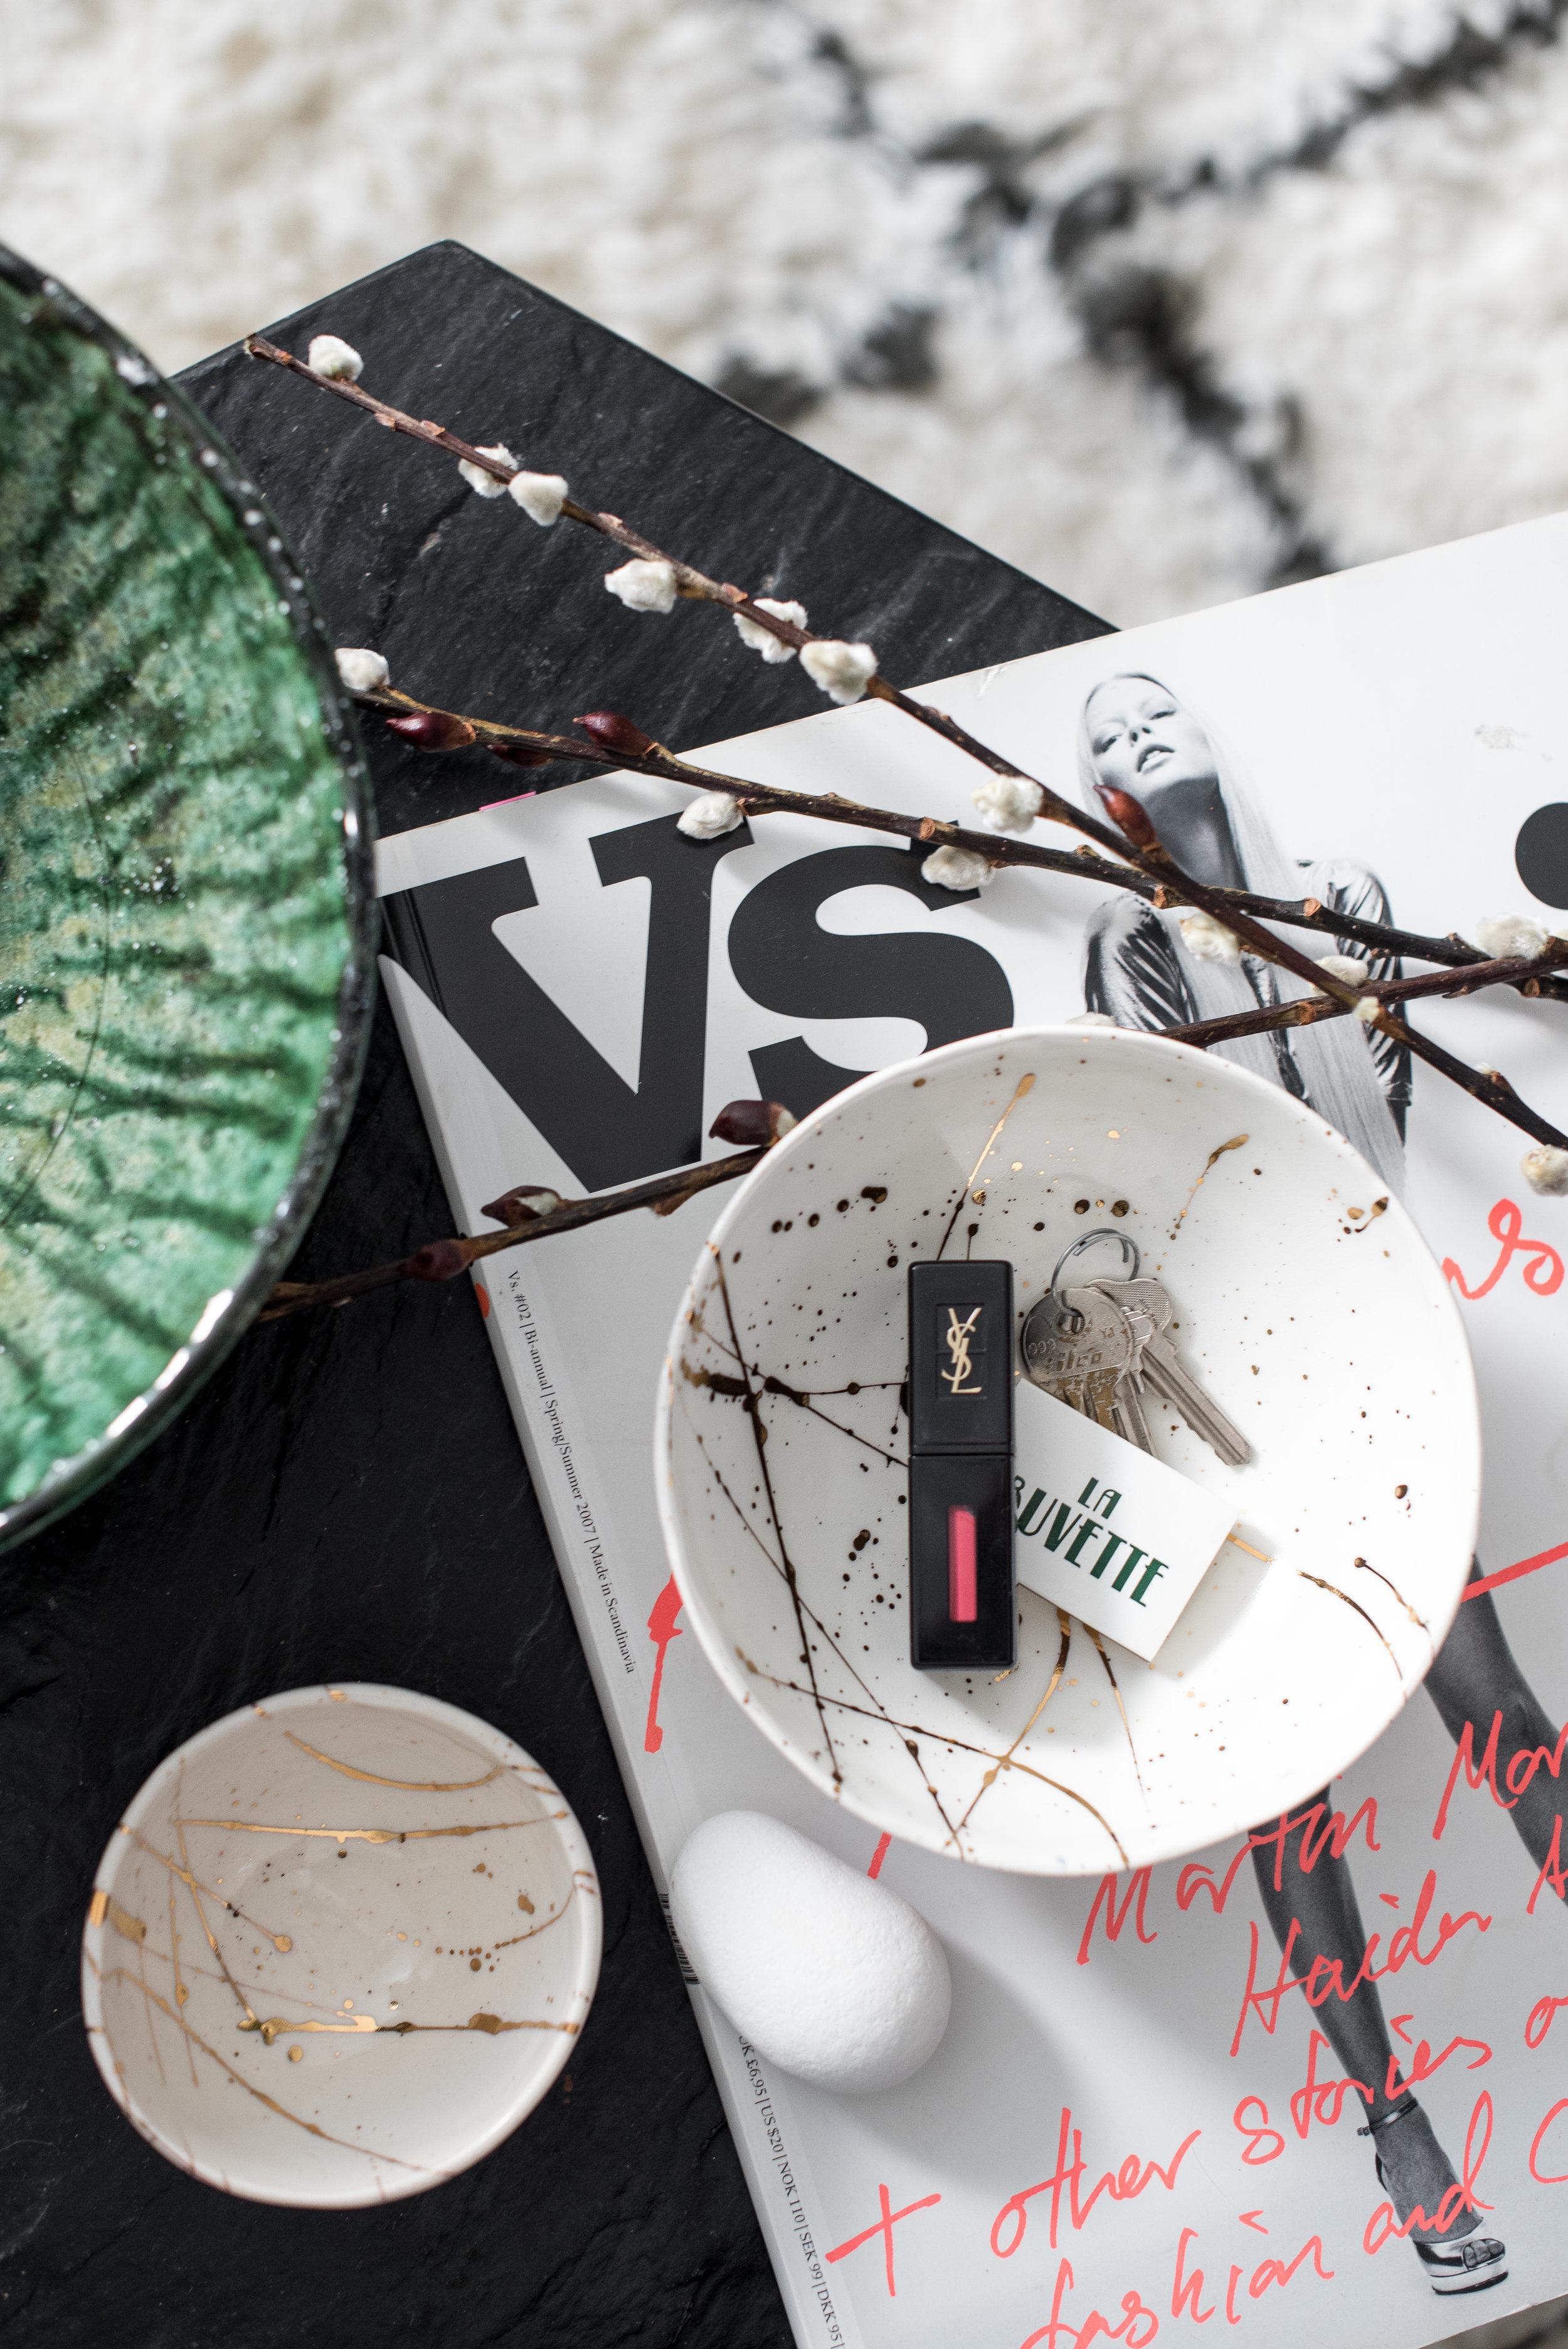 mariella-cruzado-splendor-styling-pottery-photography-dc